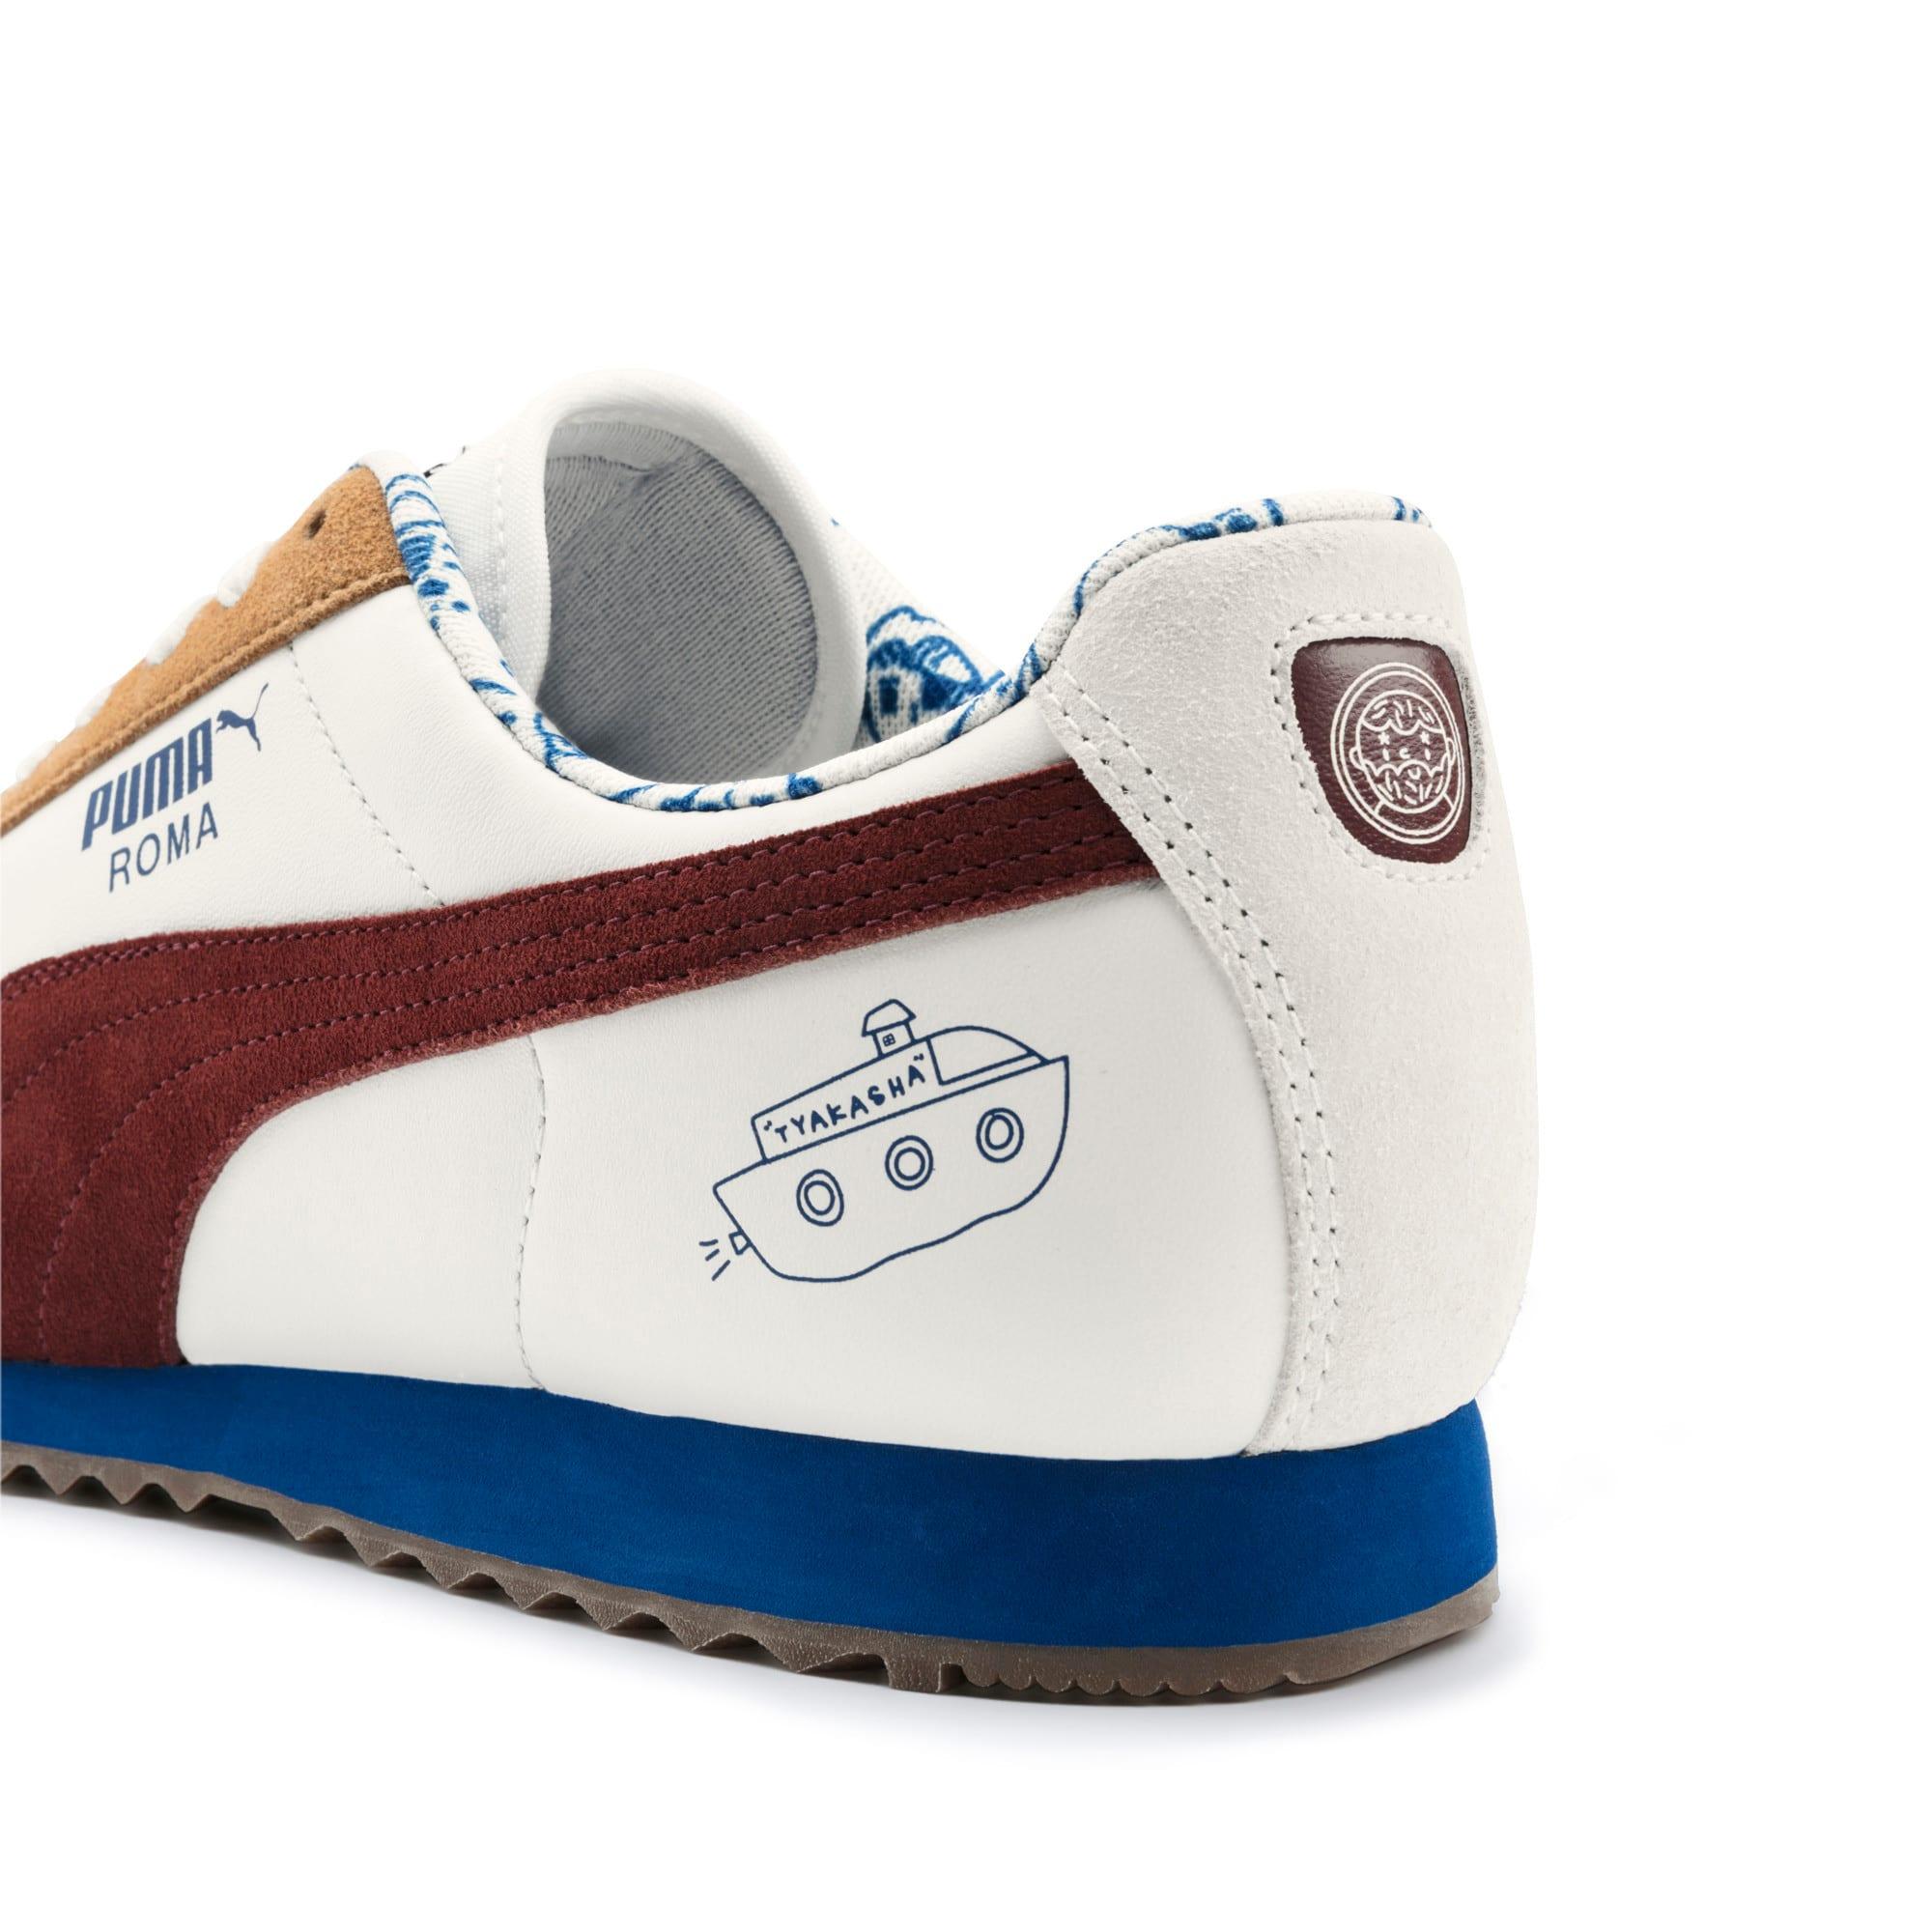 Thumbnail 10 of PUMA x TYAKASHA Roma Sneakers, Marshmallow-Fired Brick, medium